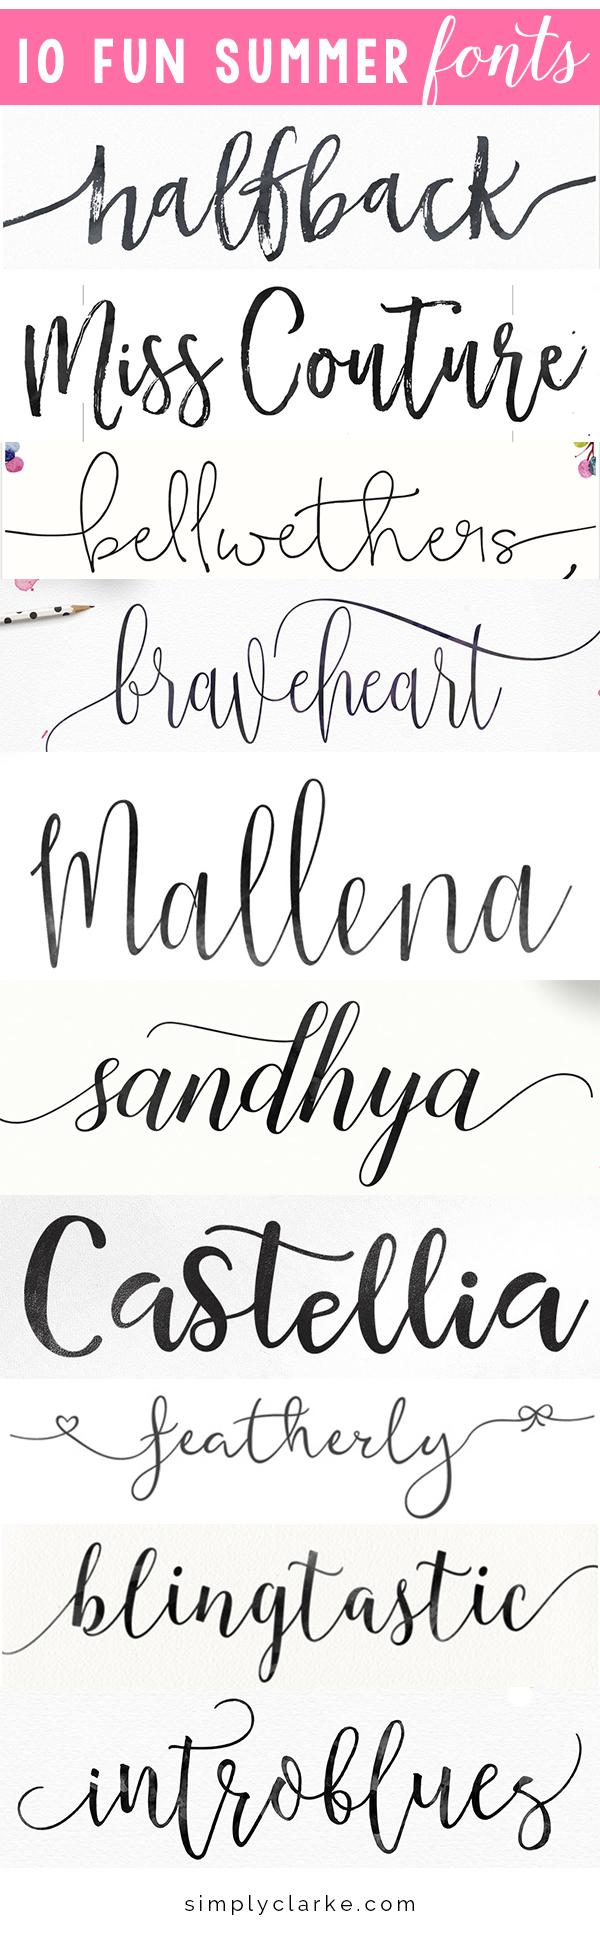 10 Fun Summer Fonts